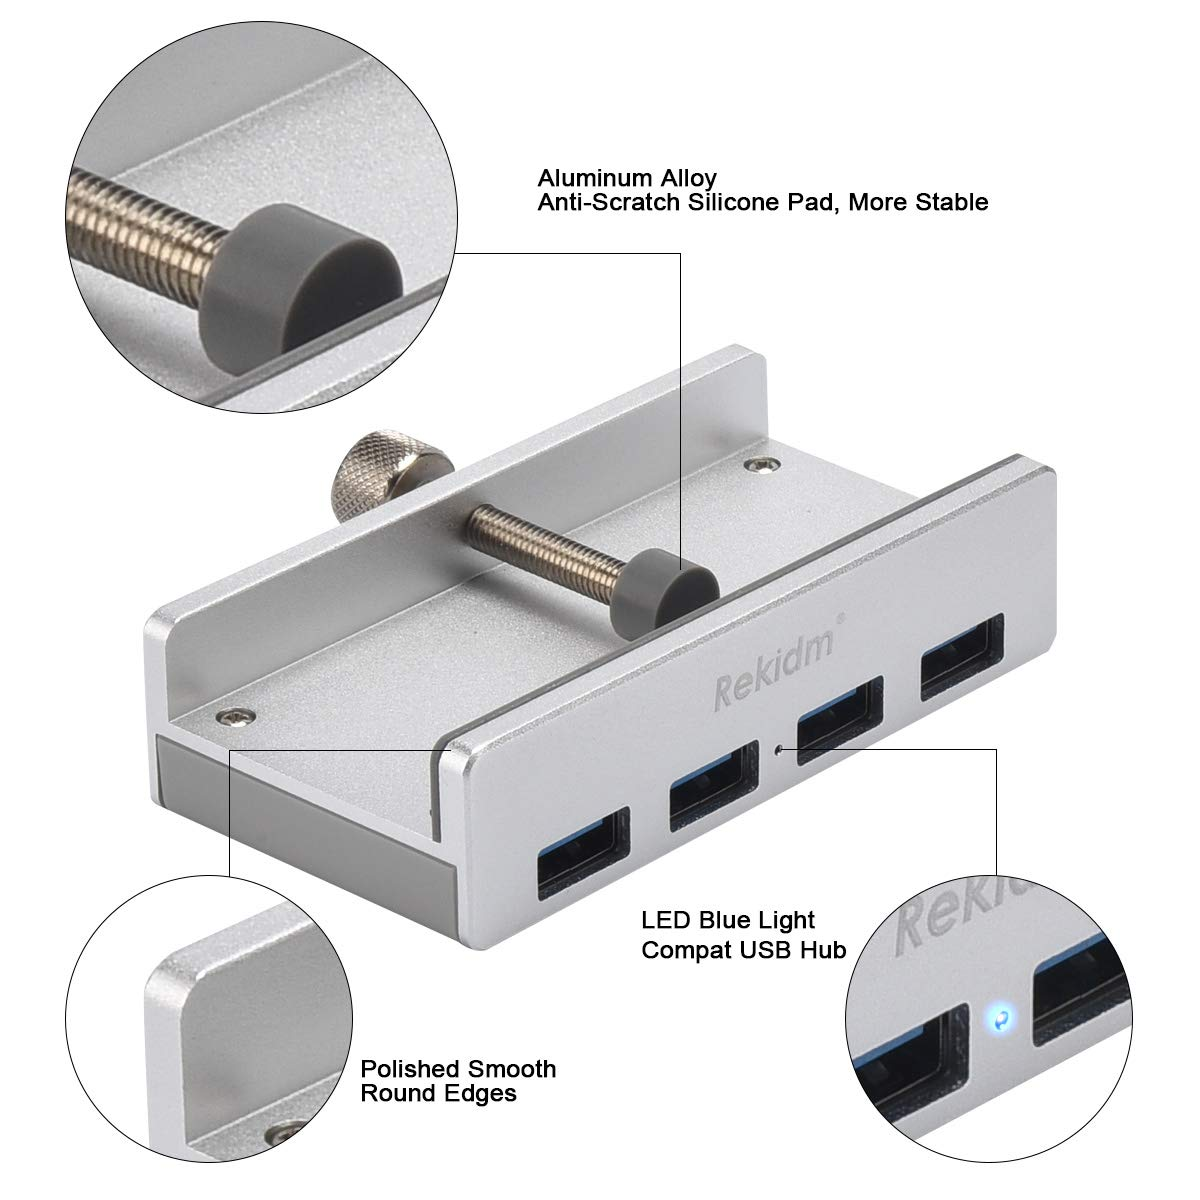 USB Hub 3.0 Silver PC Table Edge with Durable Adjustable Clip Compact Space-Saving Mountable USB Hub Fast Speed Transfer Computer Rekidm 4 Port Aluminum USB 3.0 Hub Clamp Design for Desktop